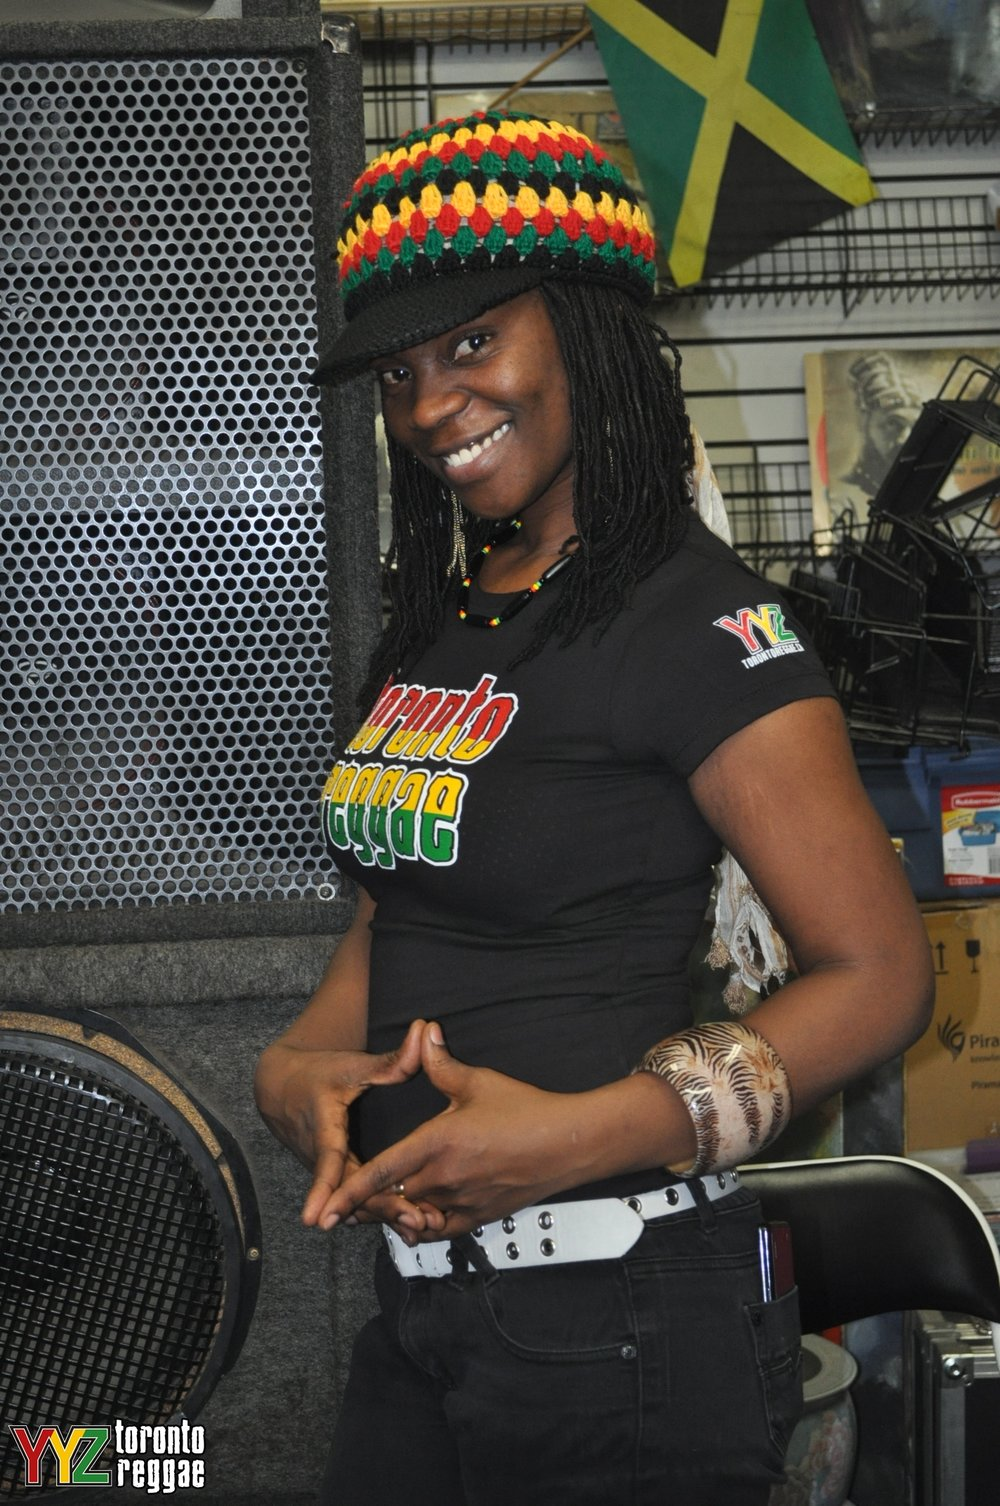 Toronto-based reggae singer Empress Minott showing off her Toronto Reggae T-Shirt! #toronto